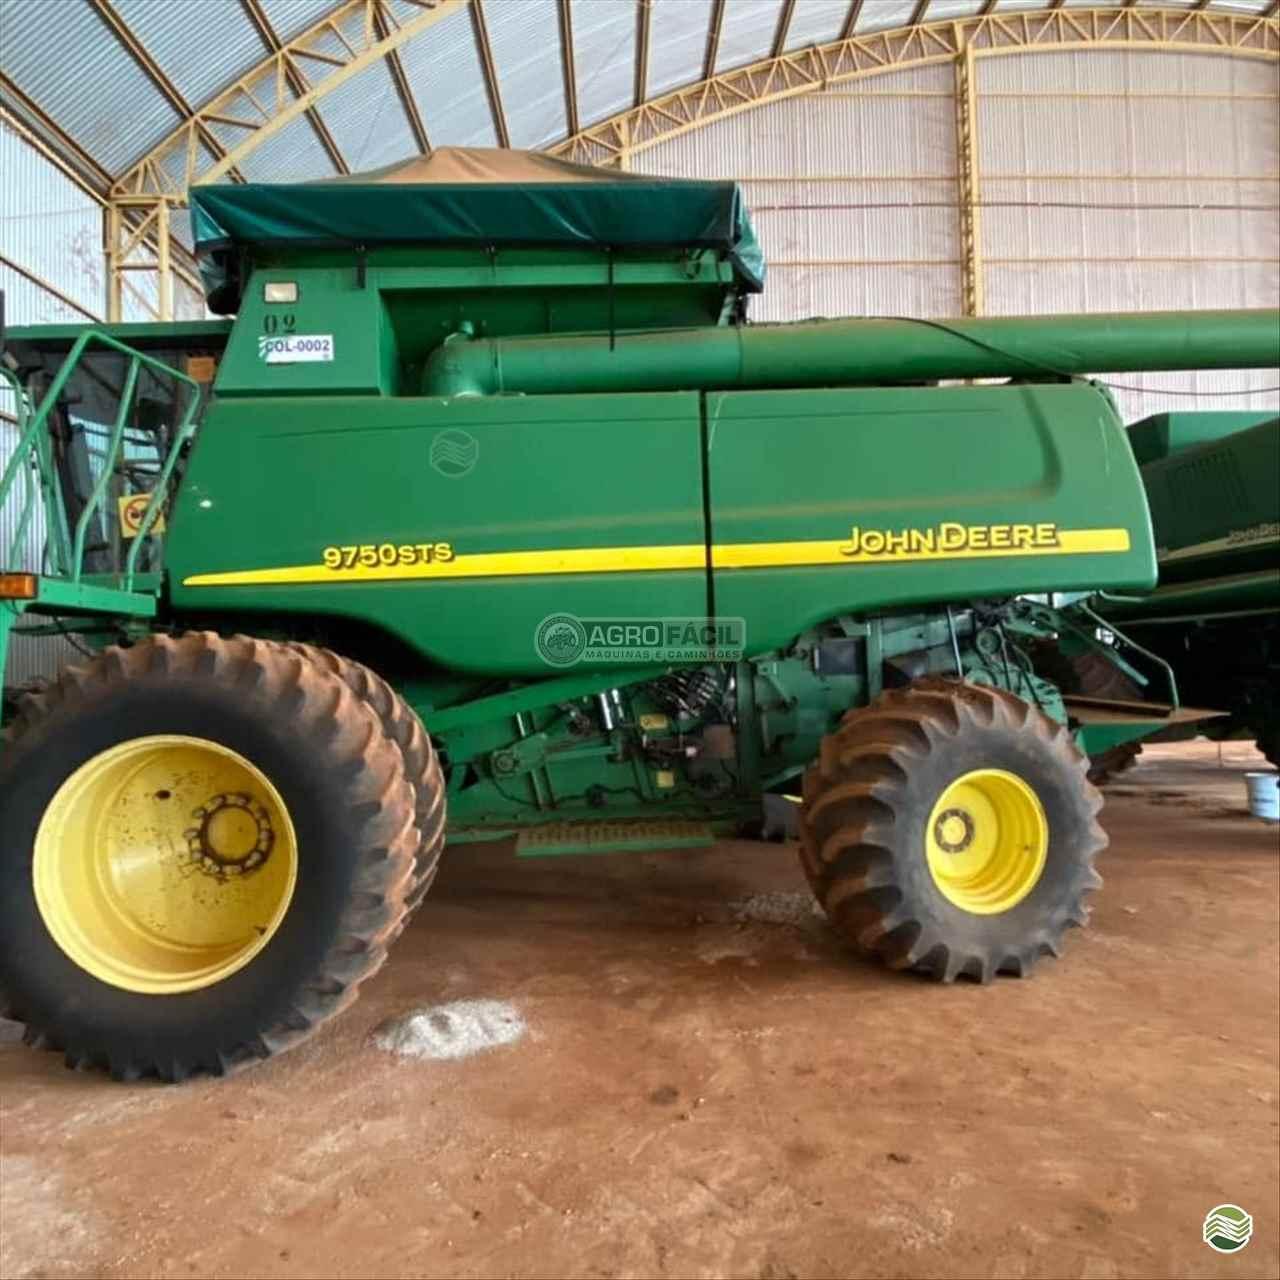 JOHN DEERE 9750 STS de Agro Fácil Máquinas - PRIMAVERA DO LESTE/MT